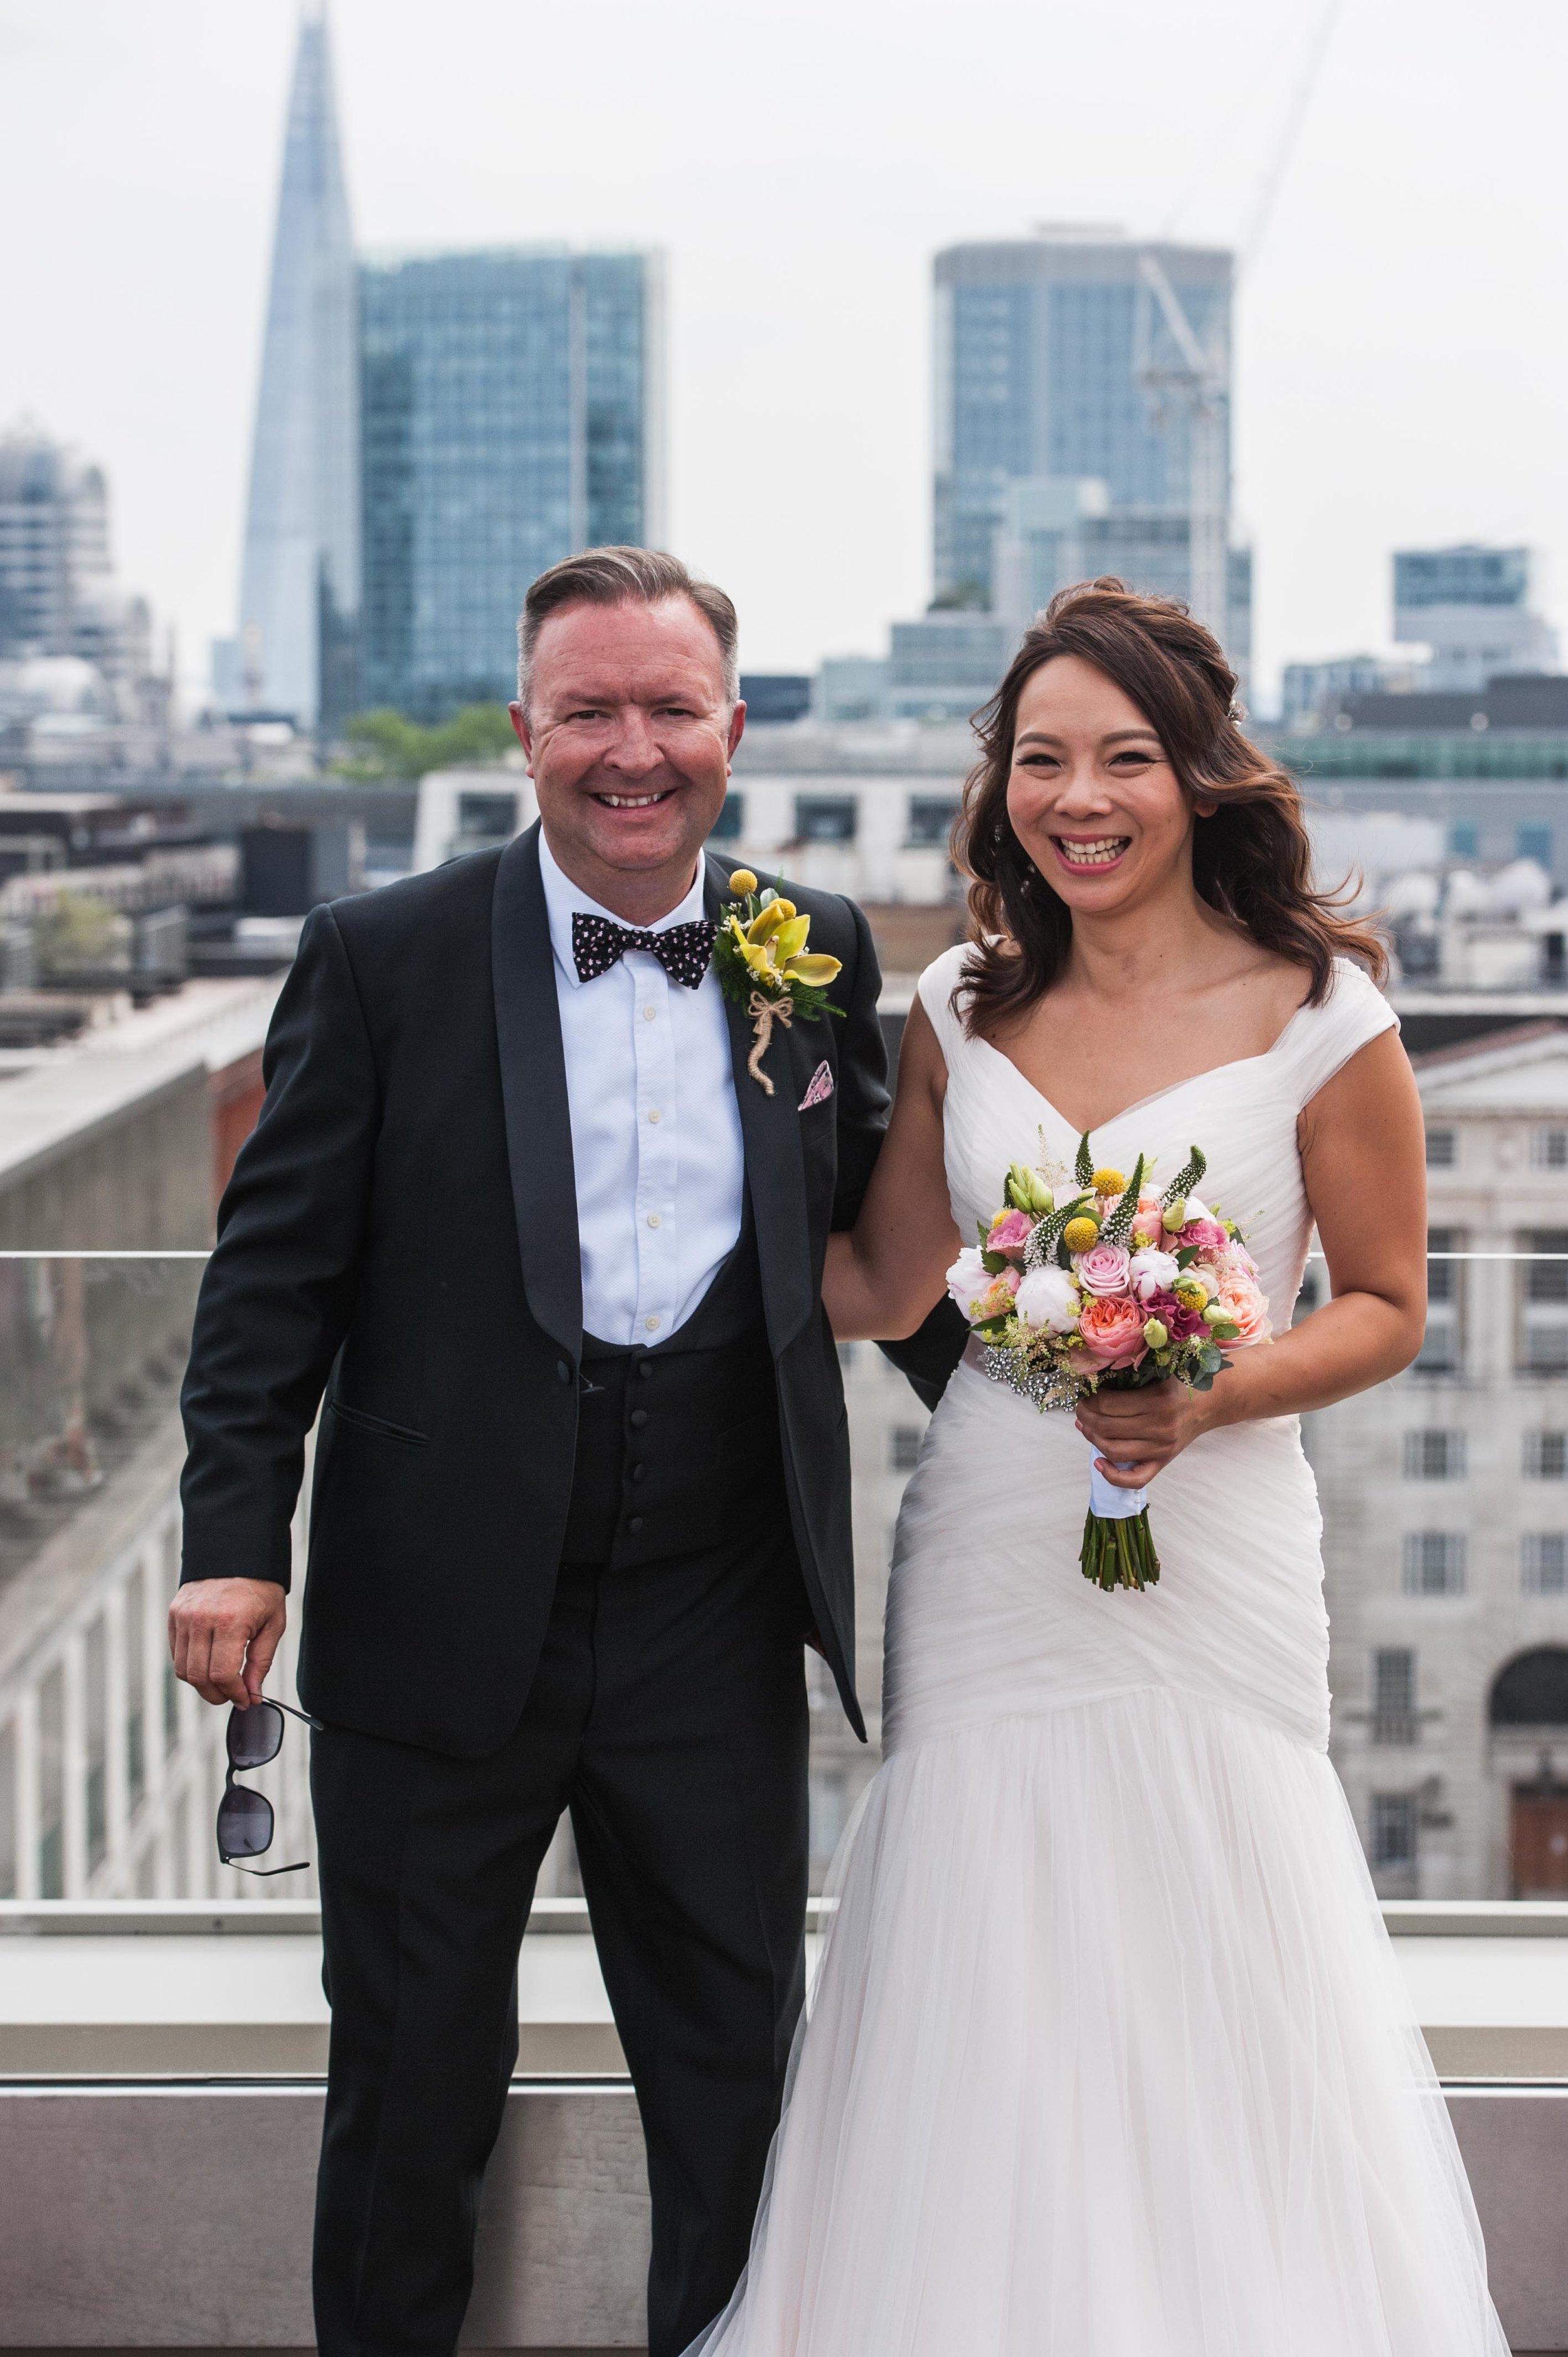 D&M_Marylebone Town Hall Wedding (40 of 239).jpg